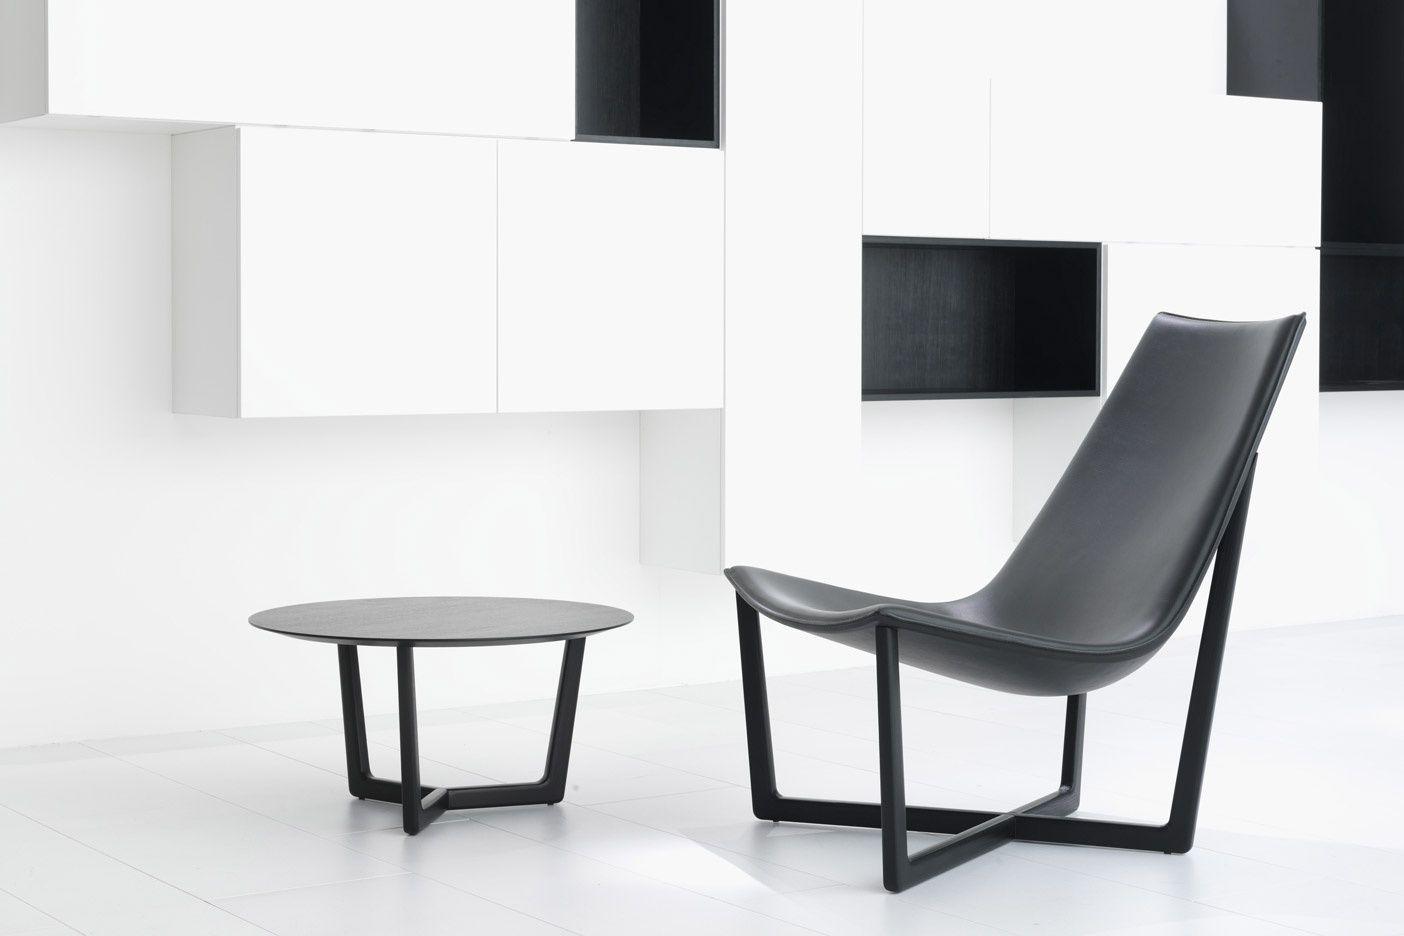 porro jade shahan -#interieurdesign #interieur #wonen #interieurinspiratie #design #interiordesign #chair #stoel #porro  www.noctum.nl